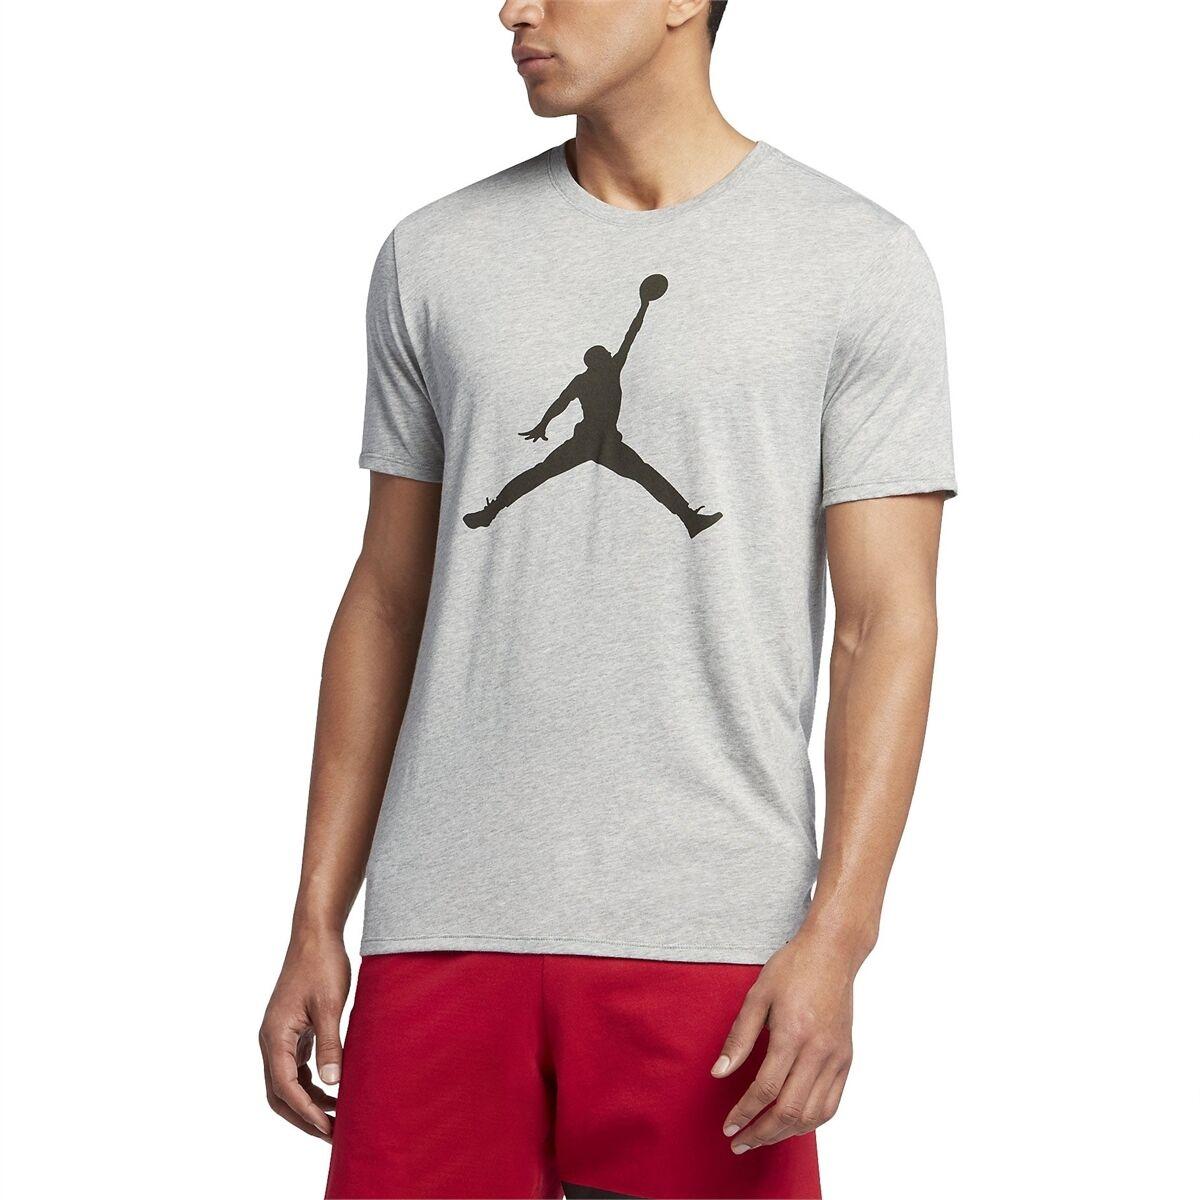 Jordan Iconic Jumpman Logo Men's T-Shirts Dark Grey Heather/Sequoia